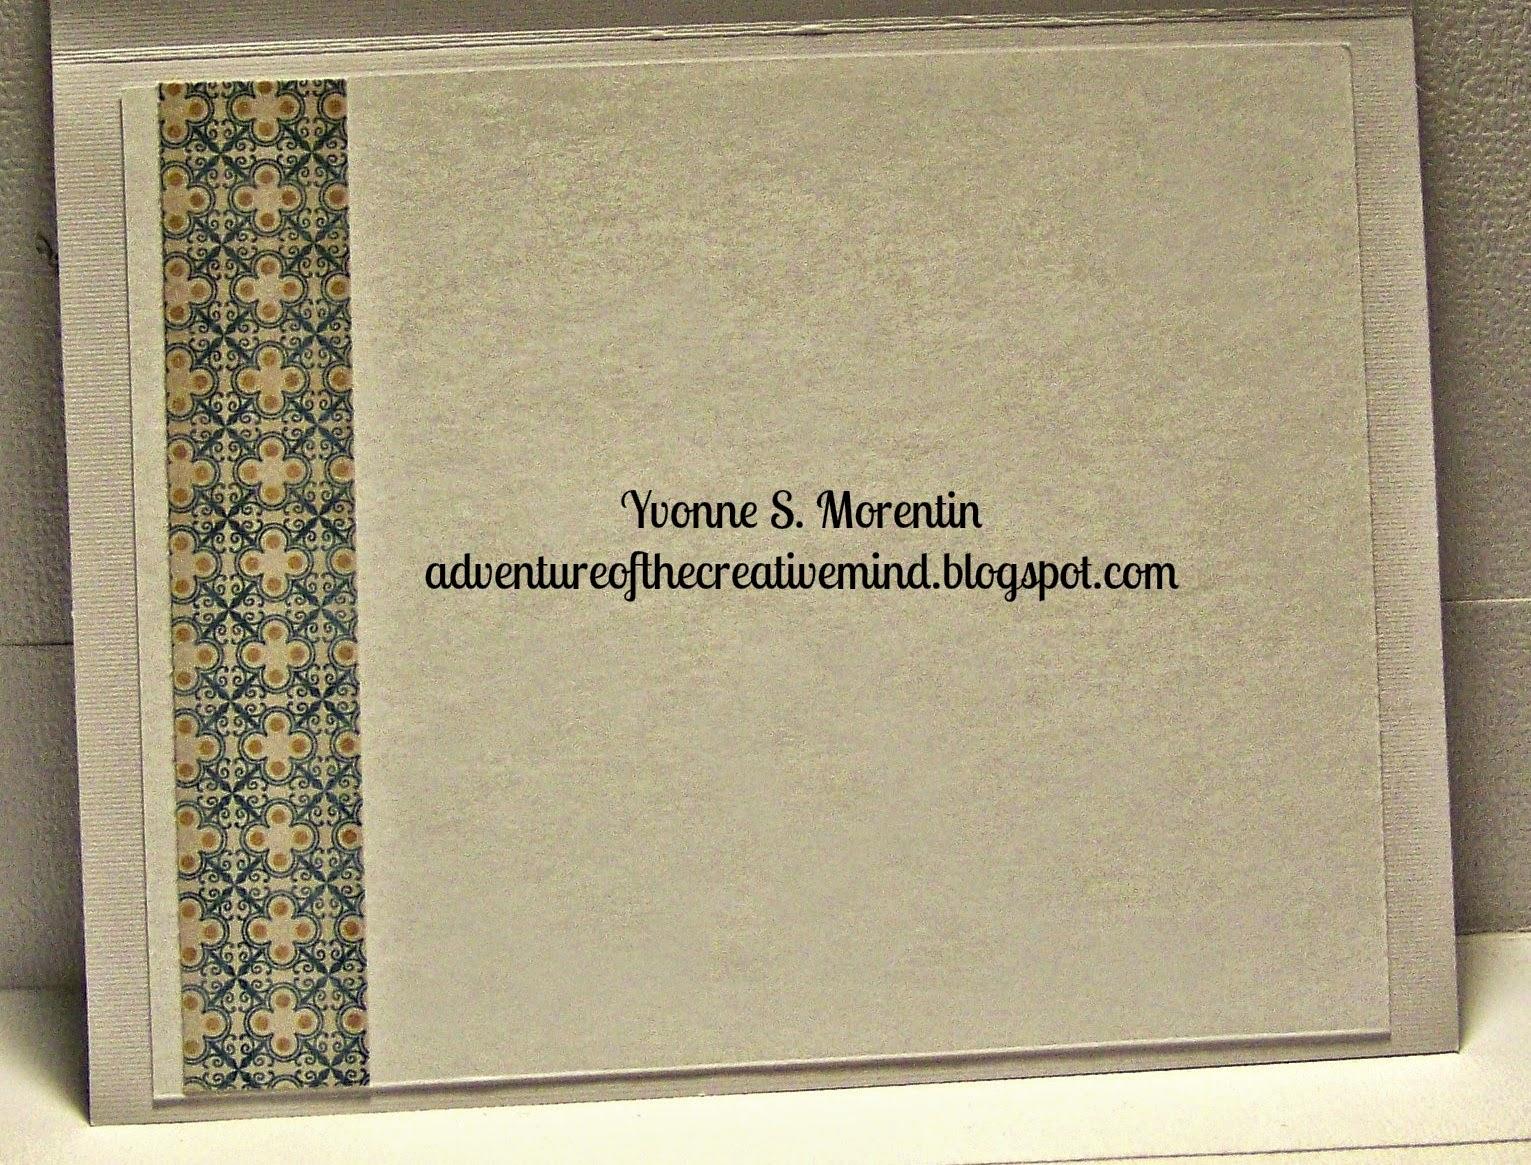 Yvonne S. Morentin- http://adventureofthecreativemind.blogspot.com/